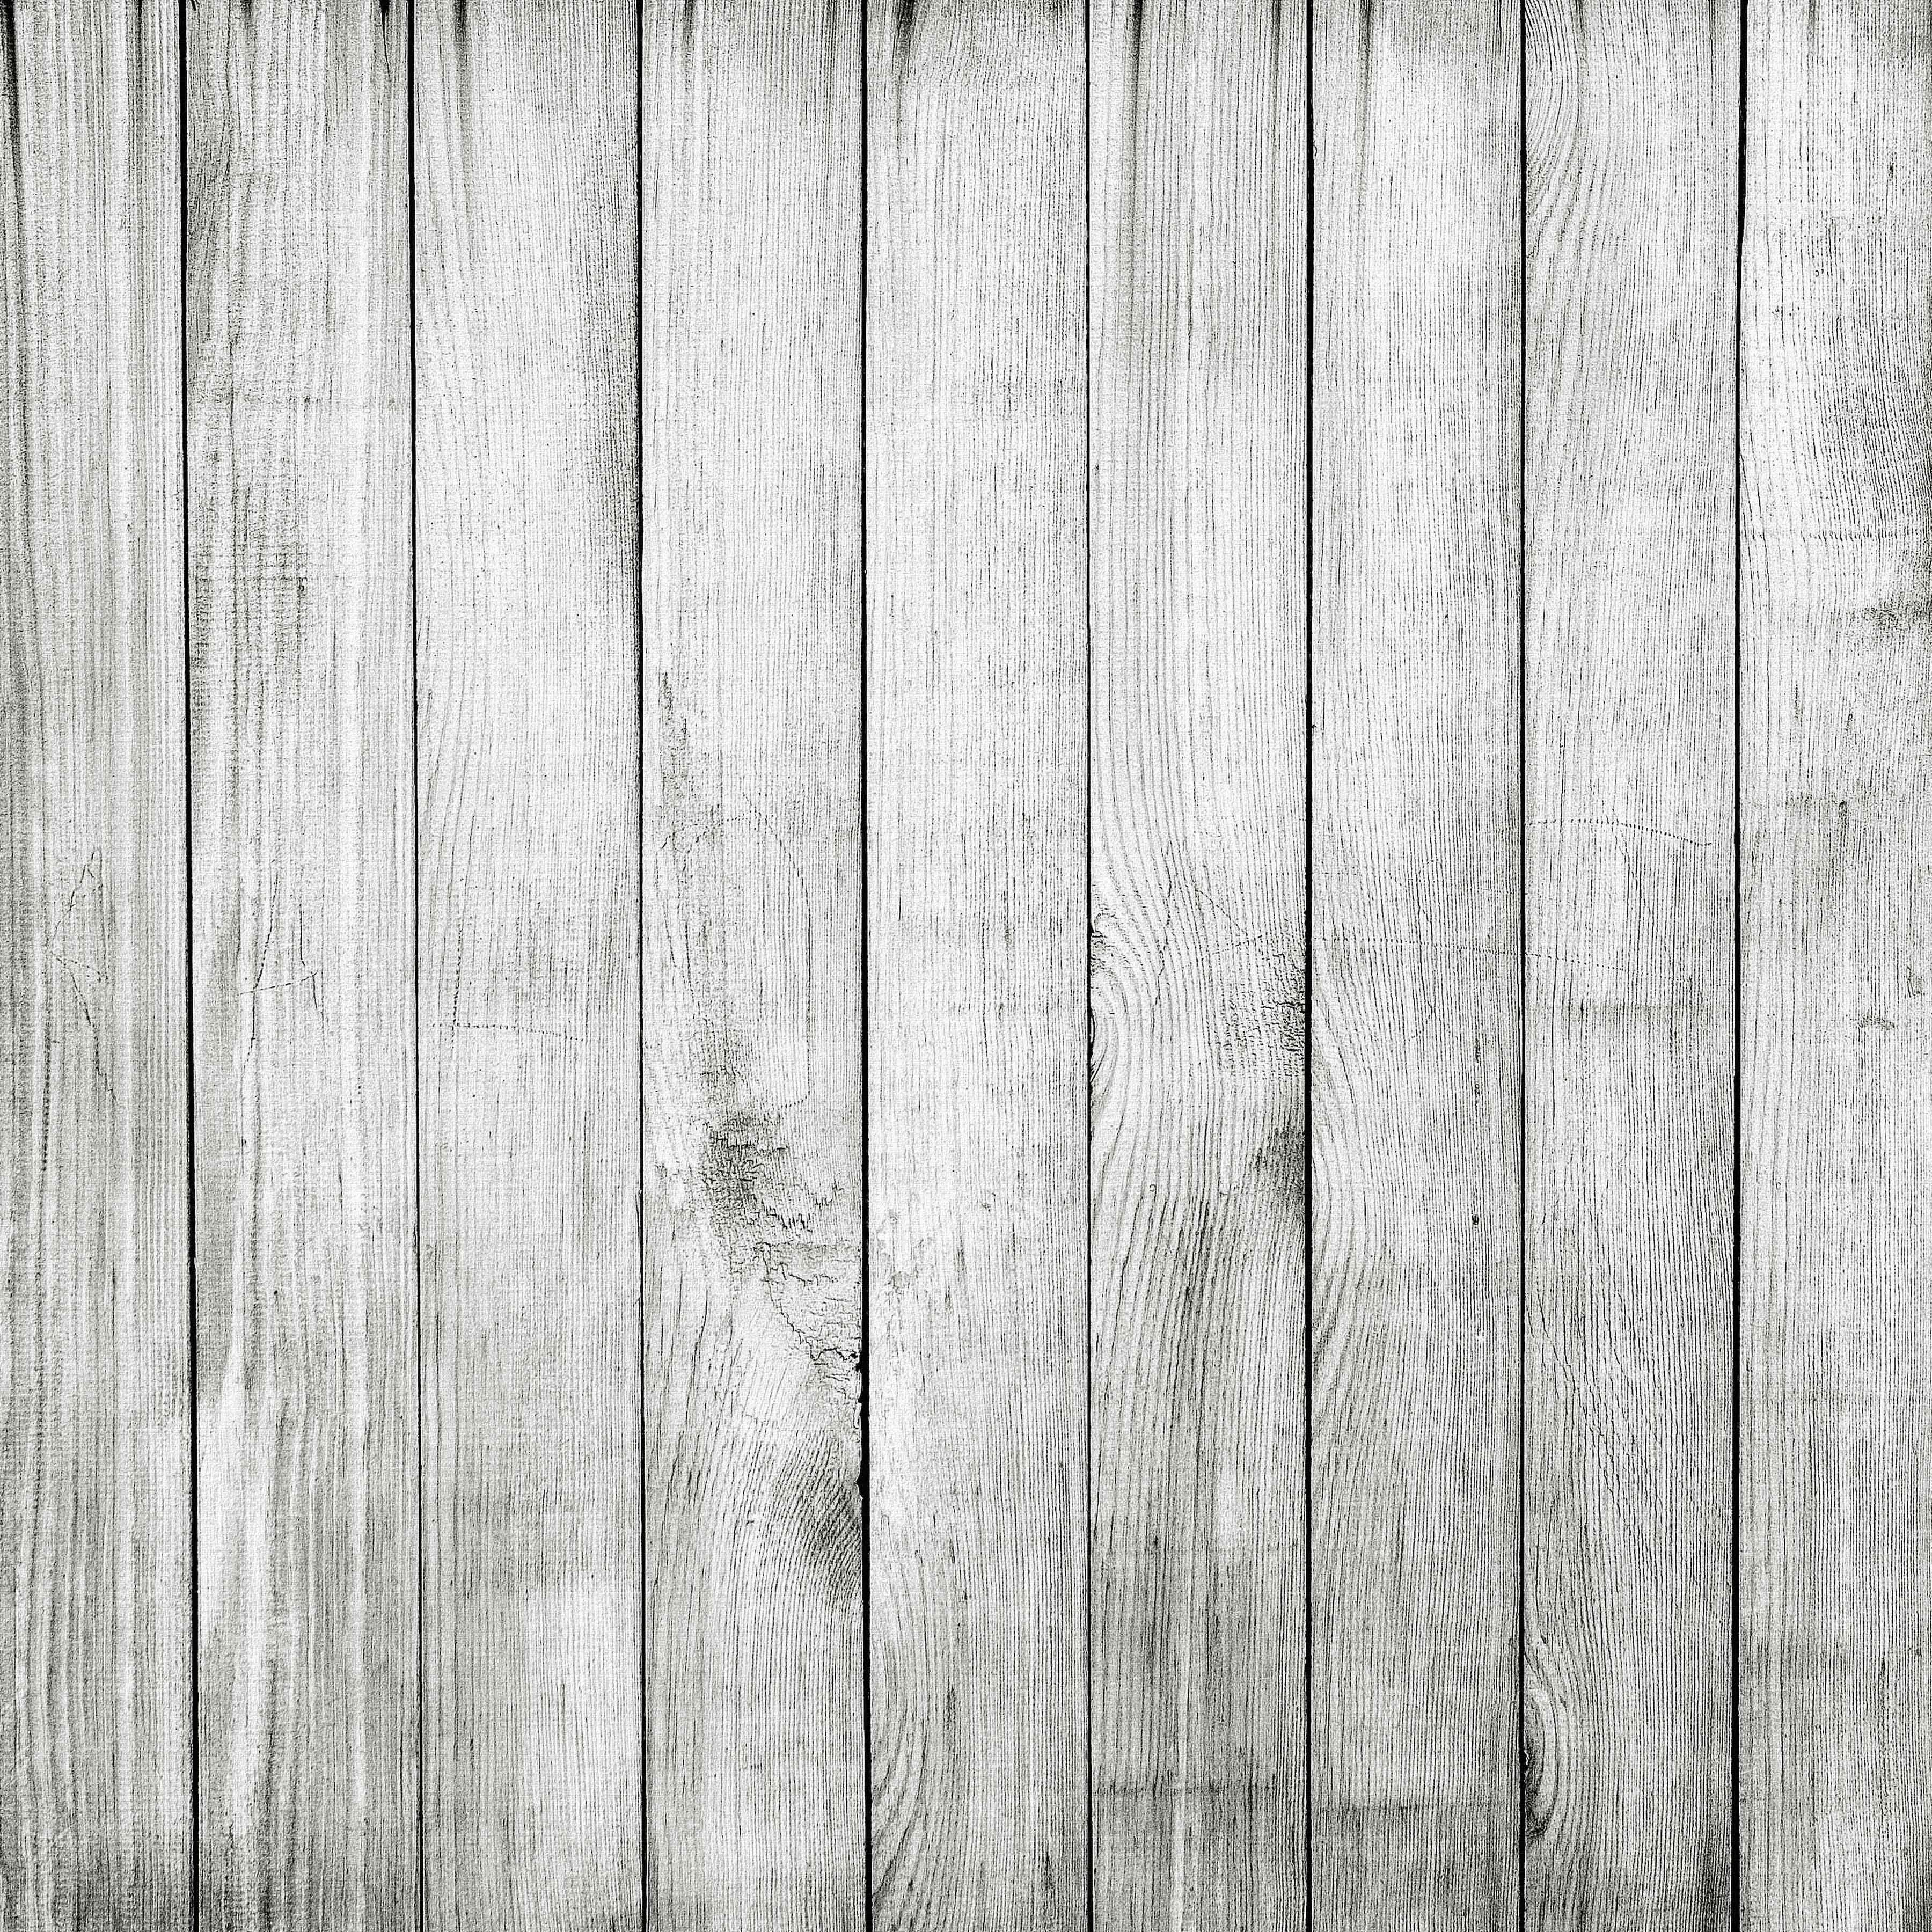 Wood Backgrounds 4 httpmedia cache ec2pinimgcom 3600x3600